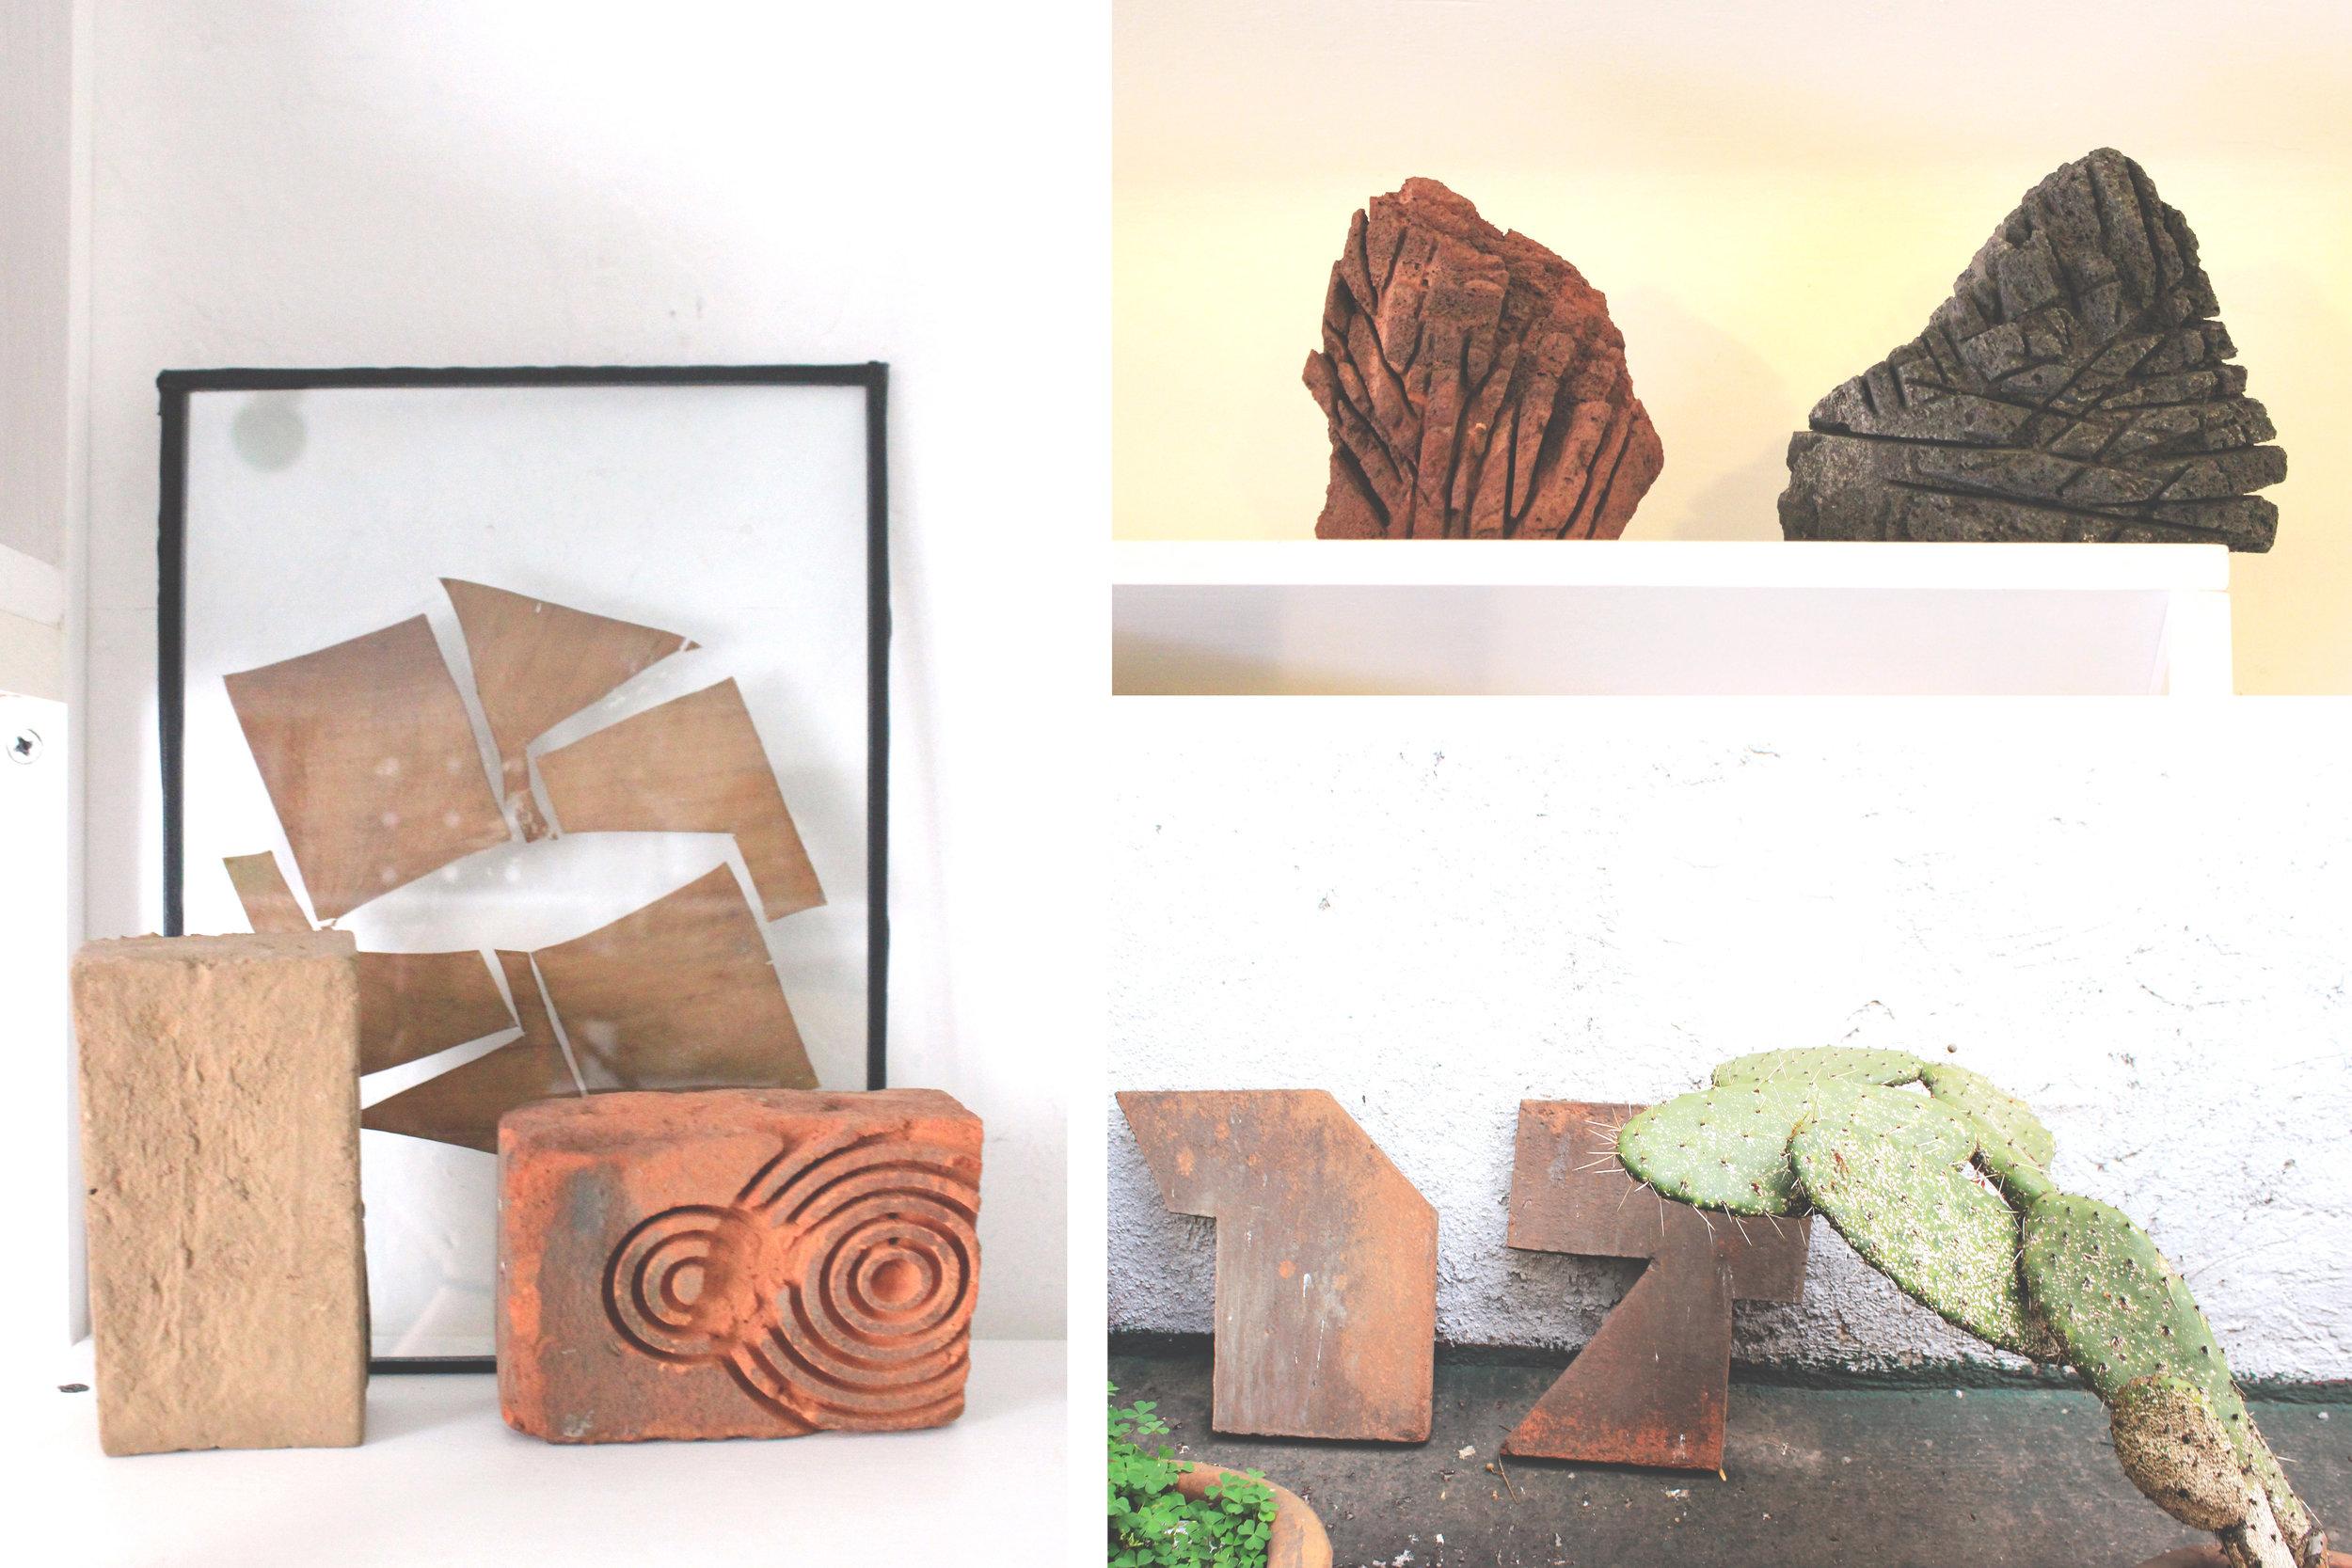 Intervened bricks experiments